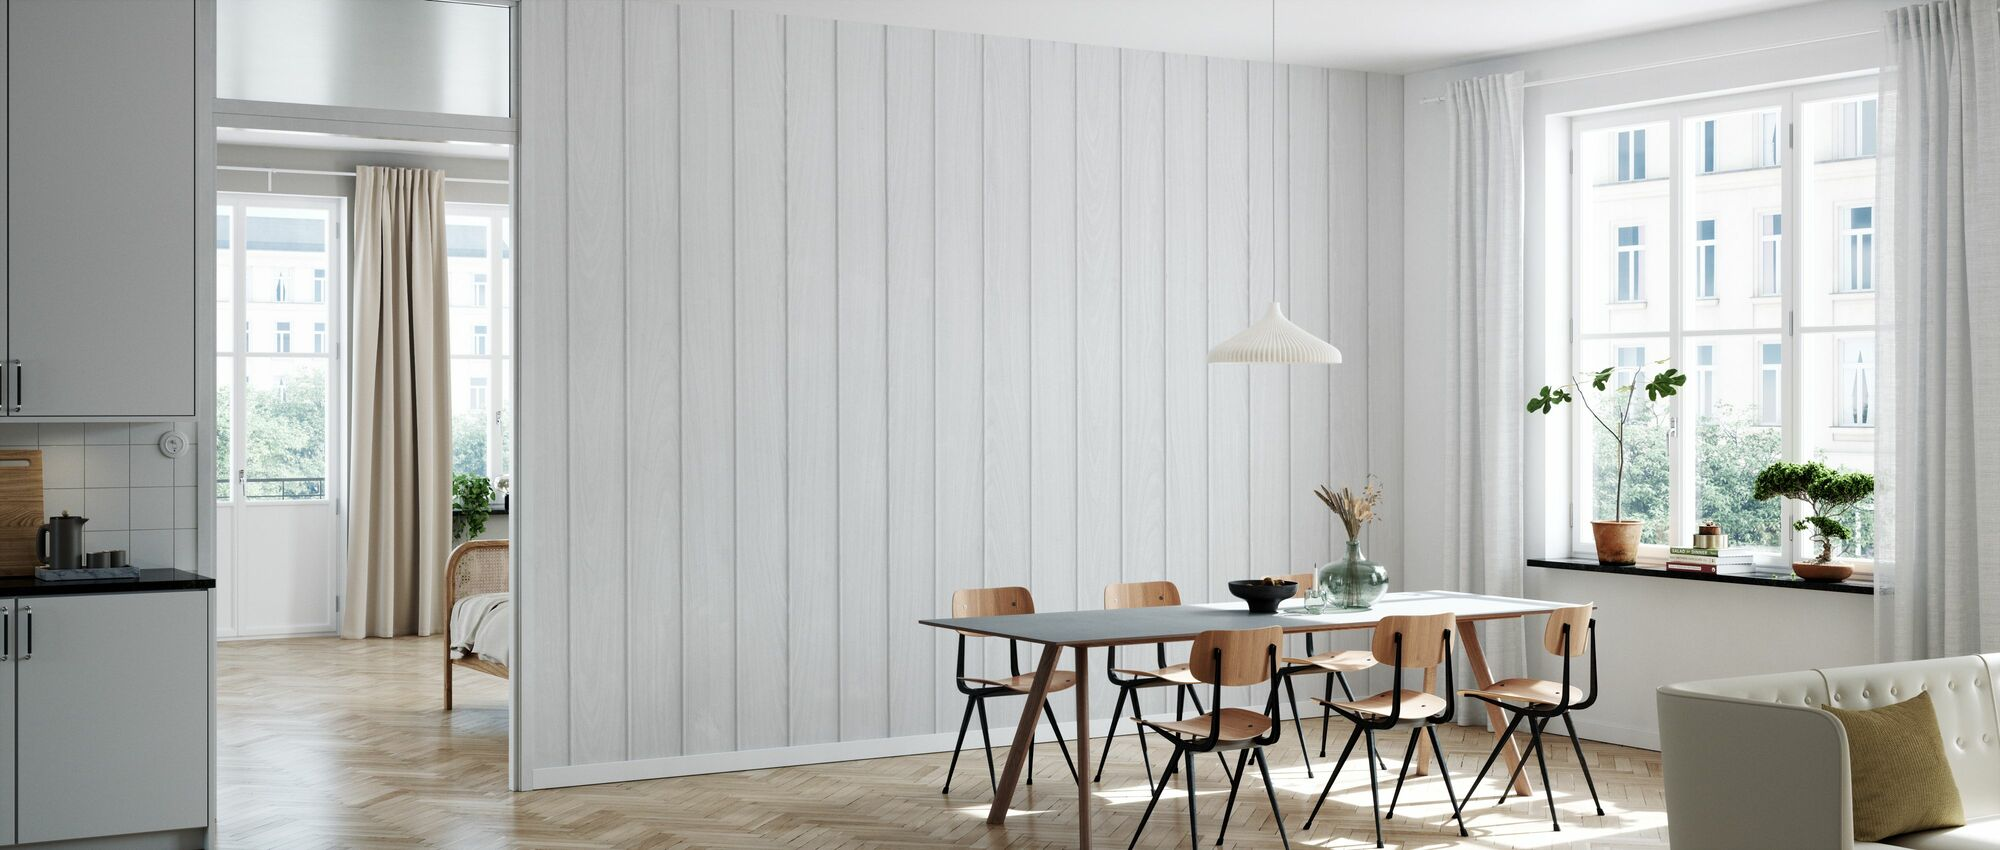 Wood Planks - Wallpaper - Kitchen